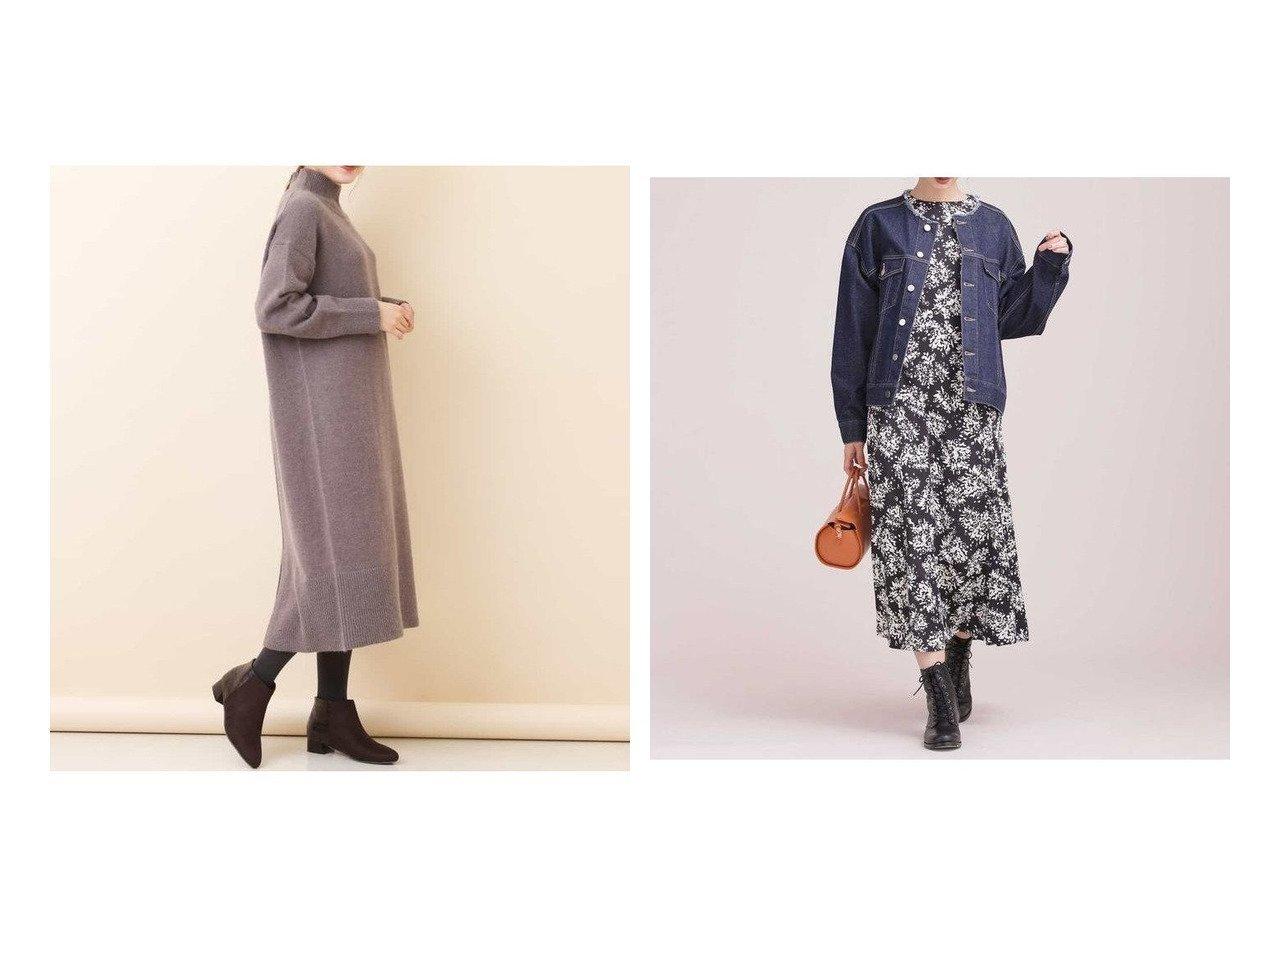 【nano universe/ナノ ユニバース】のボタニカルフラワープリントワンピース&【a.v.v/アー ヴェー ヴェー】の【洗える】タートルニットワンピース ワンピース・ドレスのおすすめ!人気、レディースファッションの通販  おすすめで人気のファッション通販商品 インテリア・家具・キッズファッション・メンズファッション・レディースファッション・服の通販 founy(ファニー) https://founy.com/ ファッション Fashion レディース WOMEN ワンピース Dress ニットワンピース Knit Dresses シンプル スリット 今冬 Winter ウォッシャブル サテン トレンド フラワー プリント ボタニカル |ID:crp329100000002919